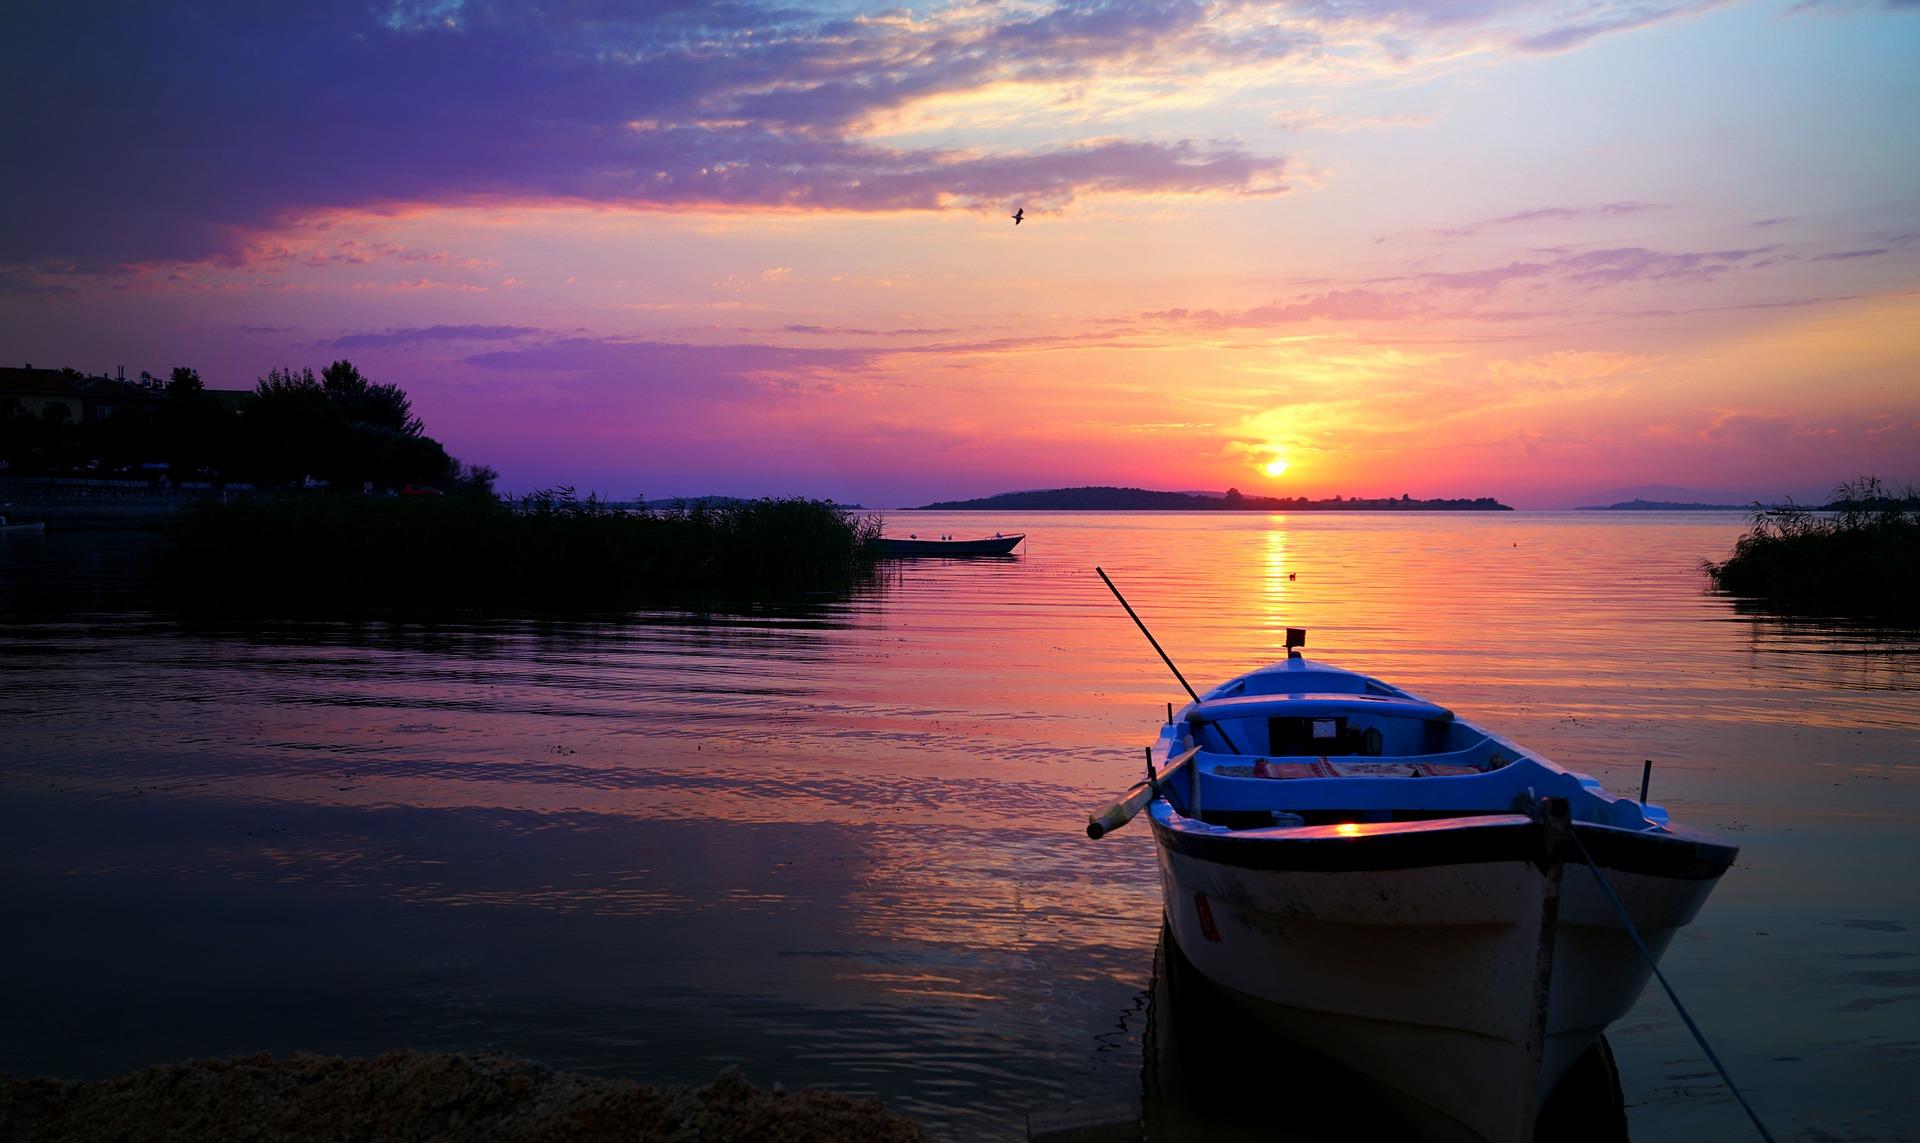 boat-2958283_1920.jpg